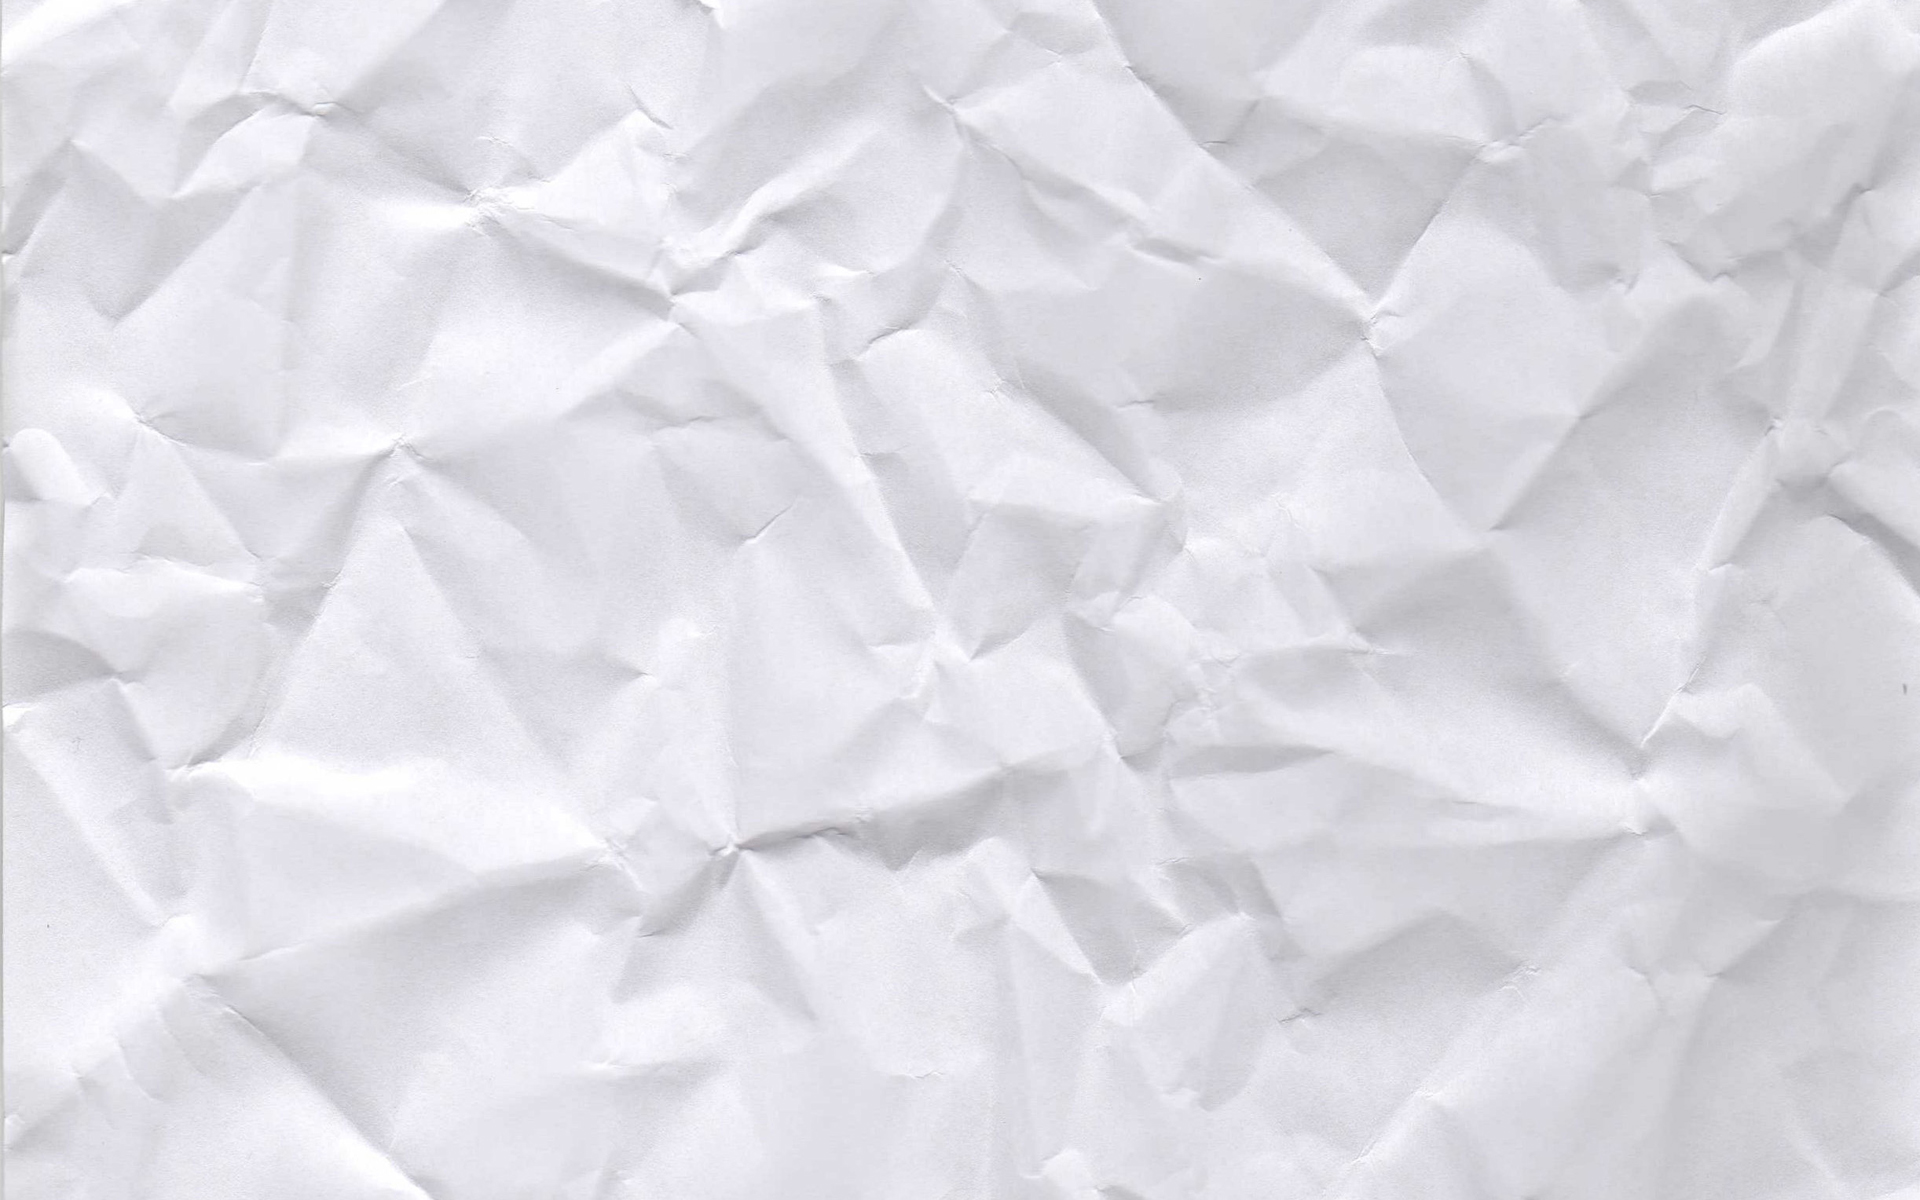 Crumpl Paper Texture Jpg, Crumpled Paper Texture Jpg